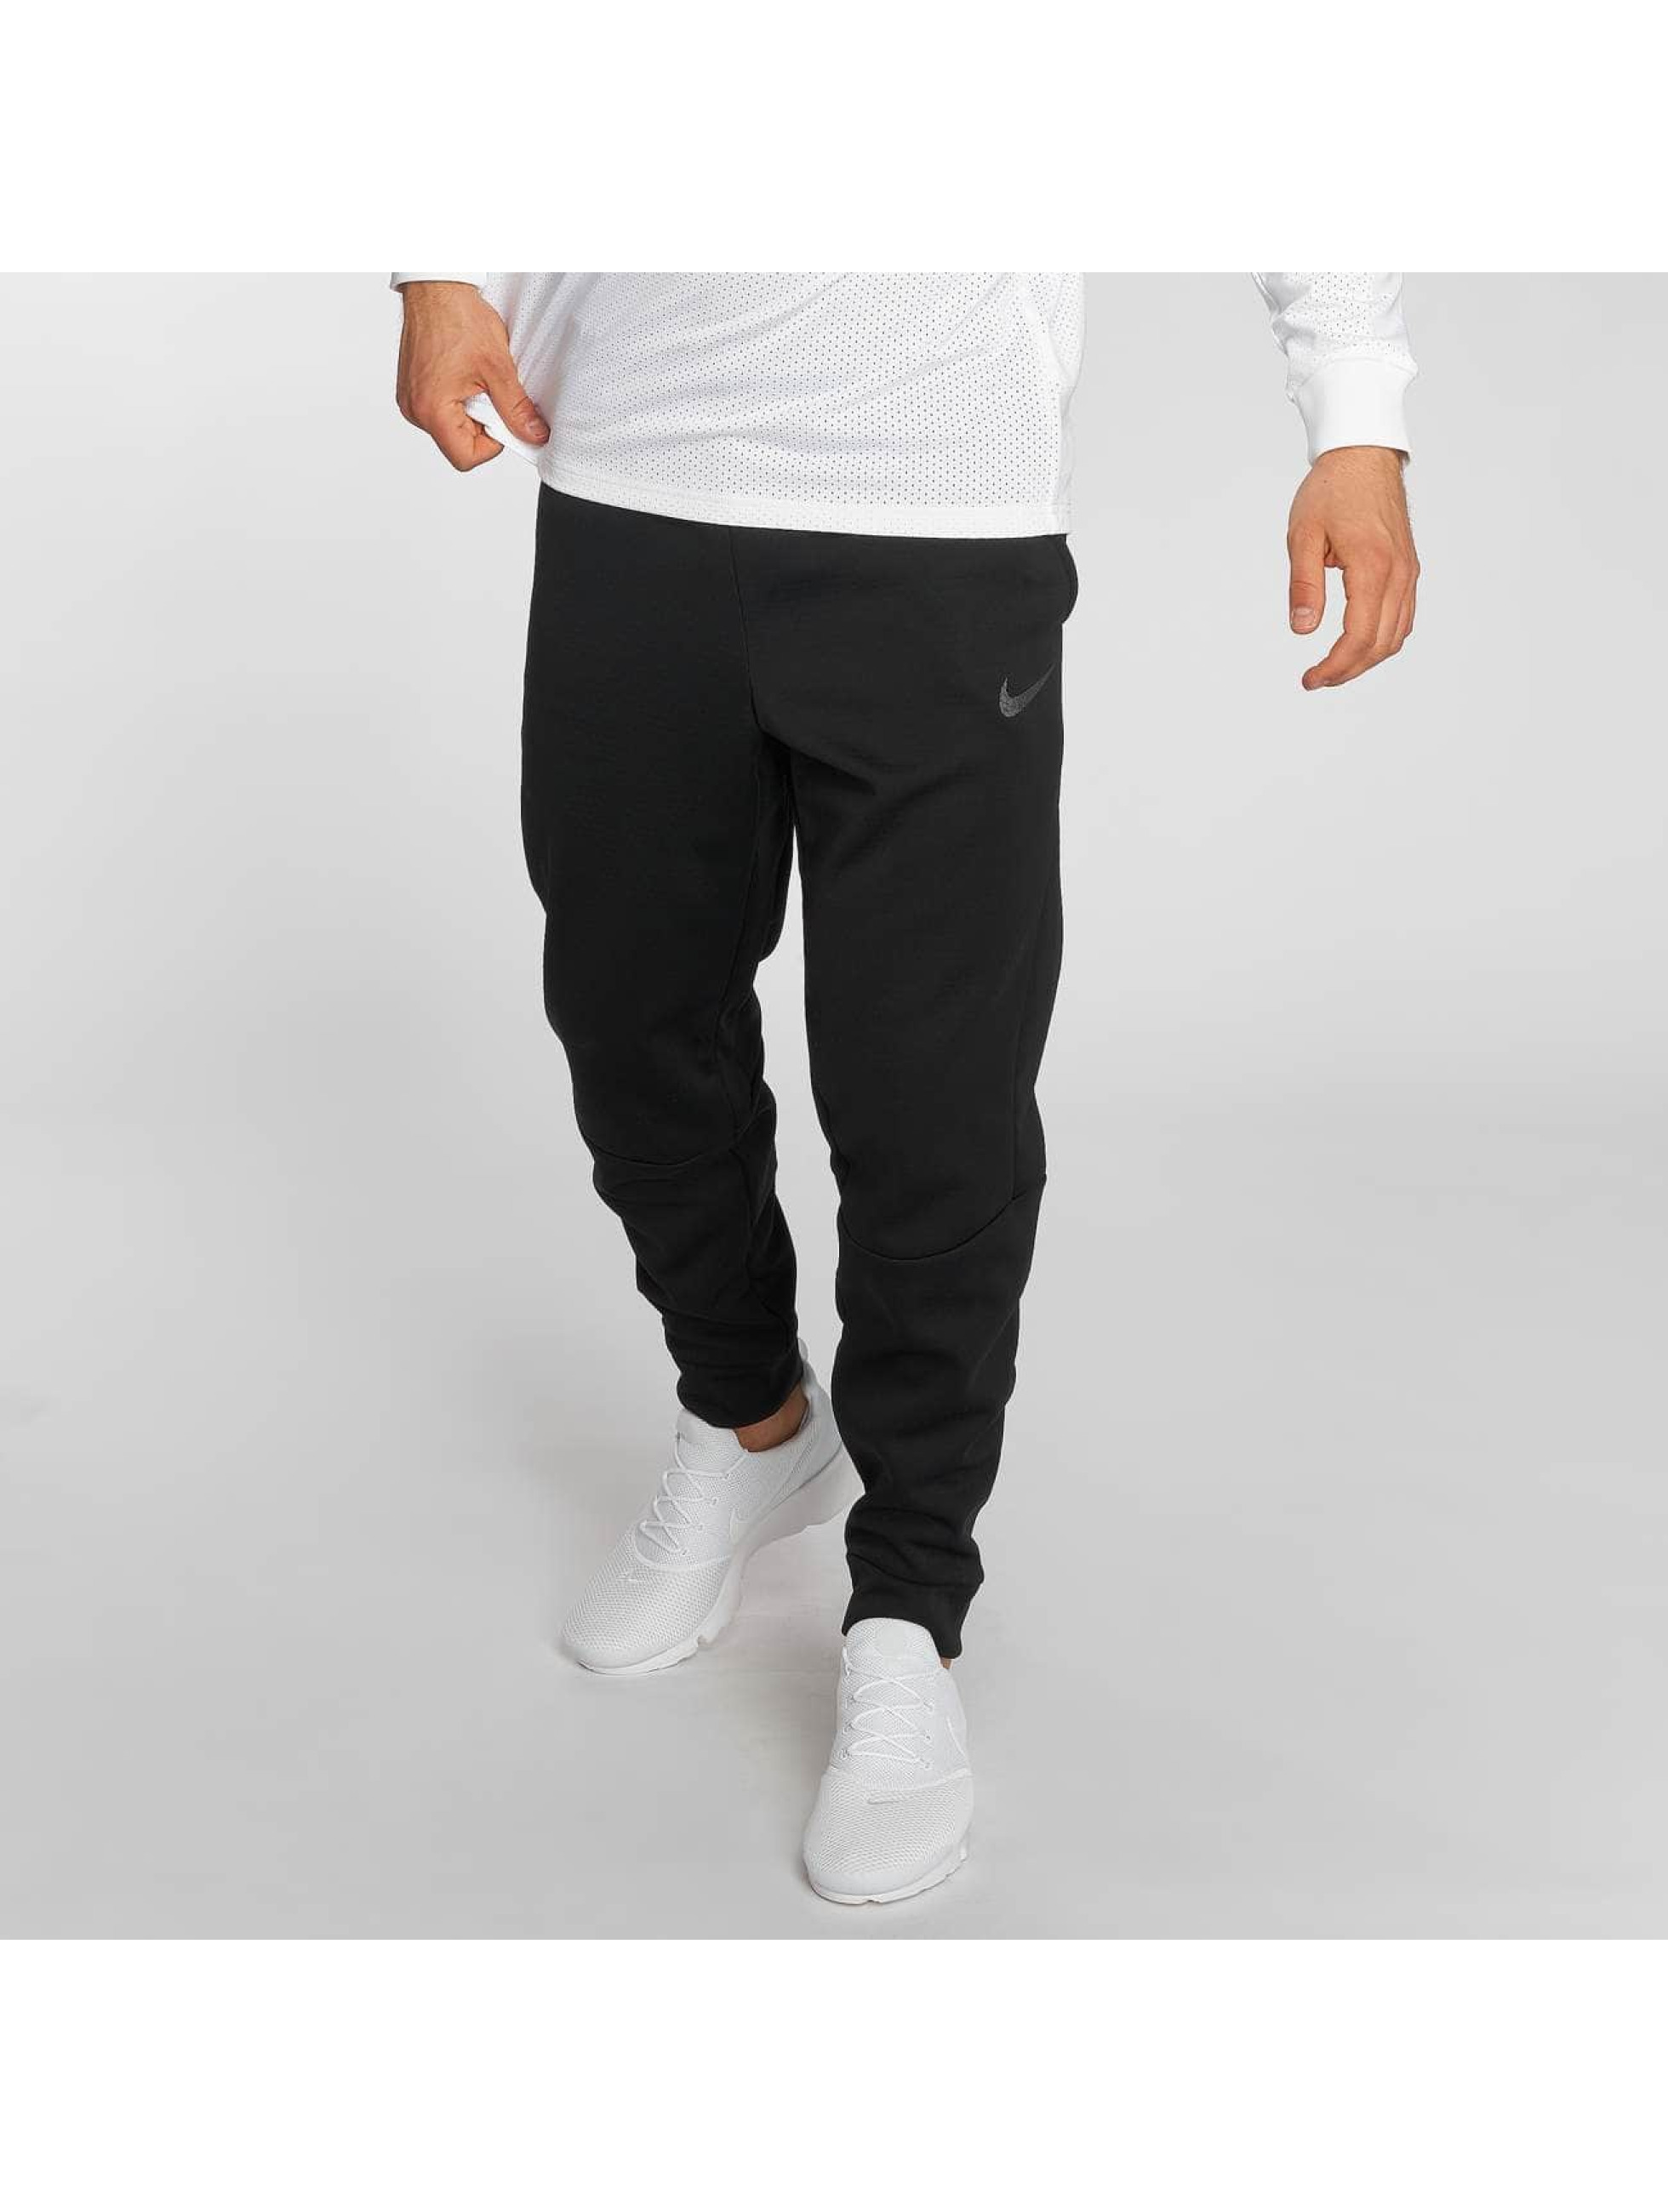 Nike Performance Pantalón deportivo Therma Sphere negro